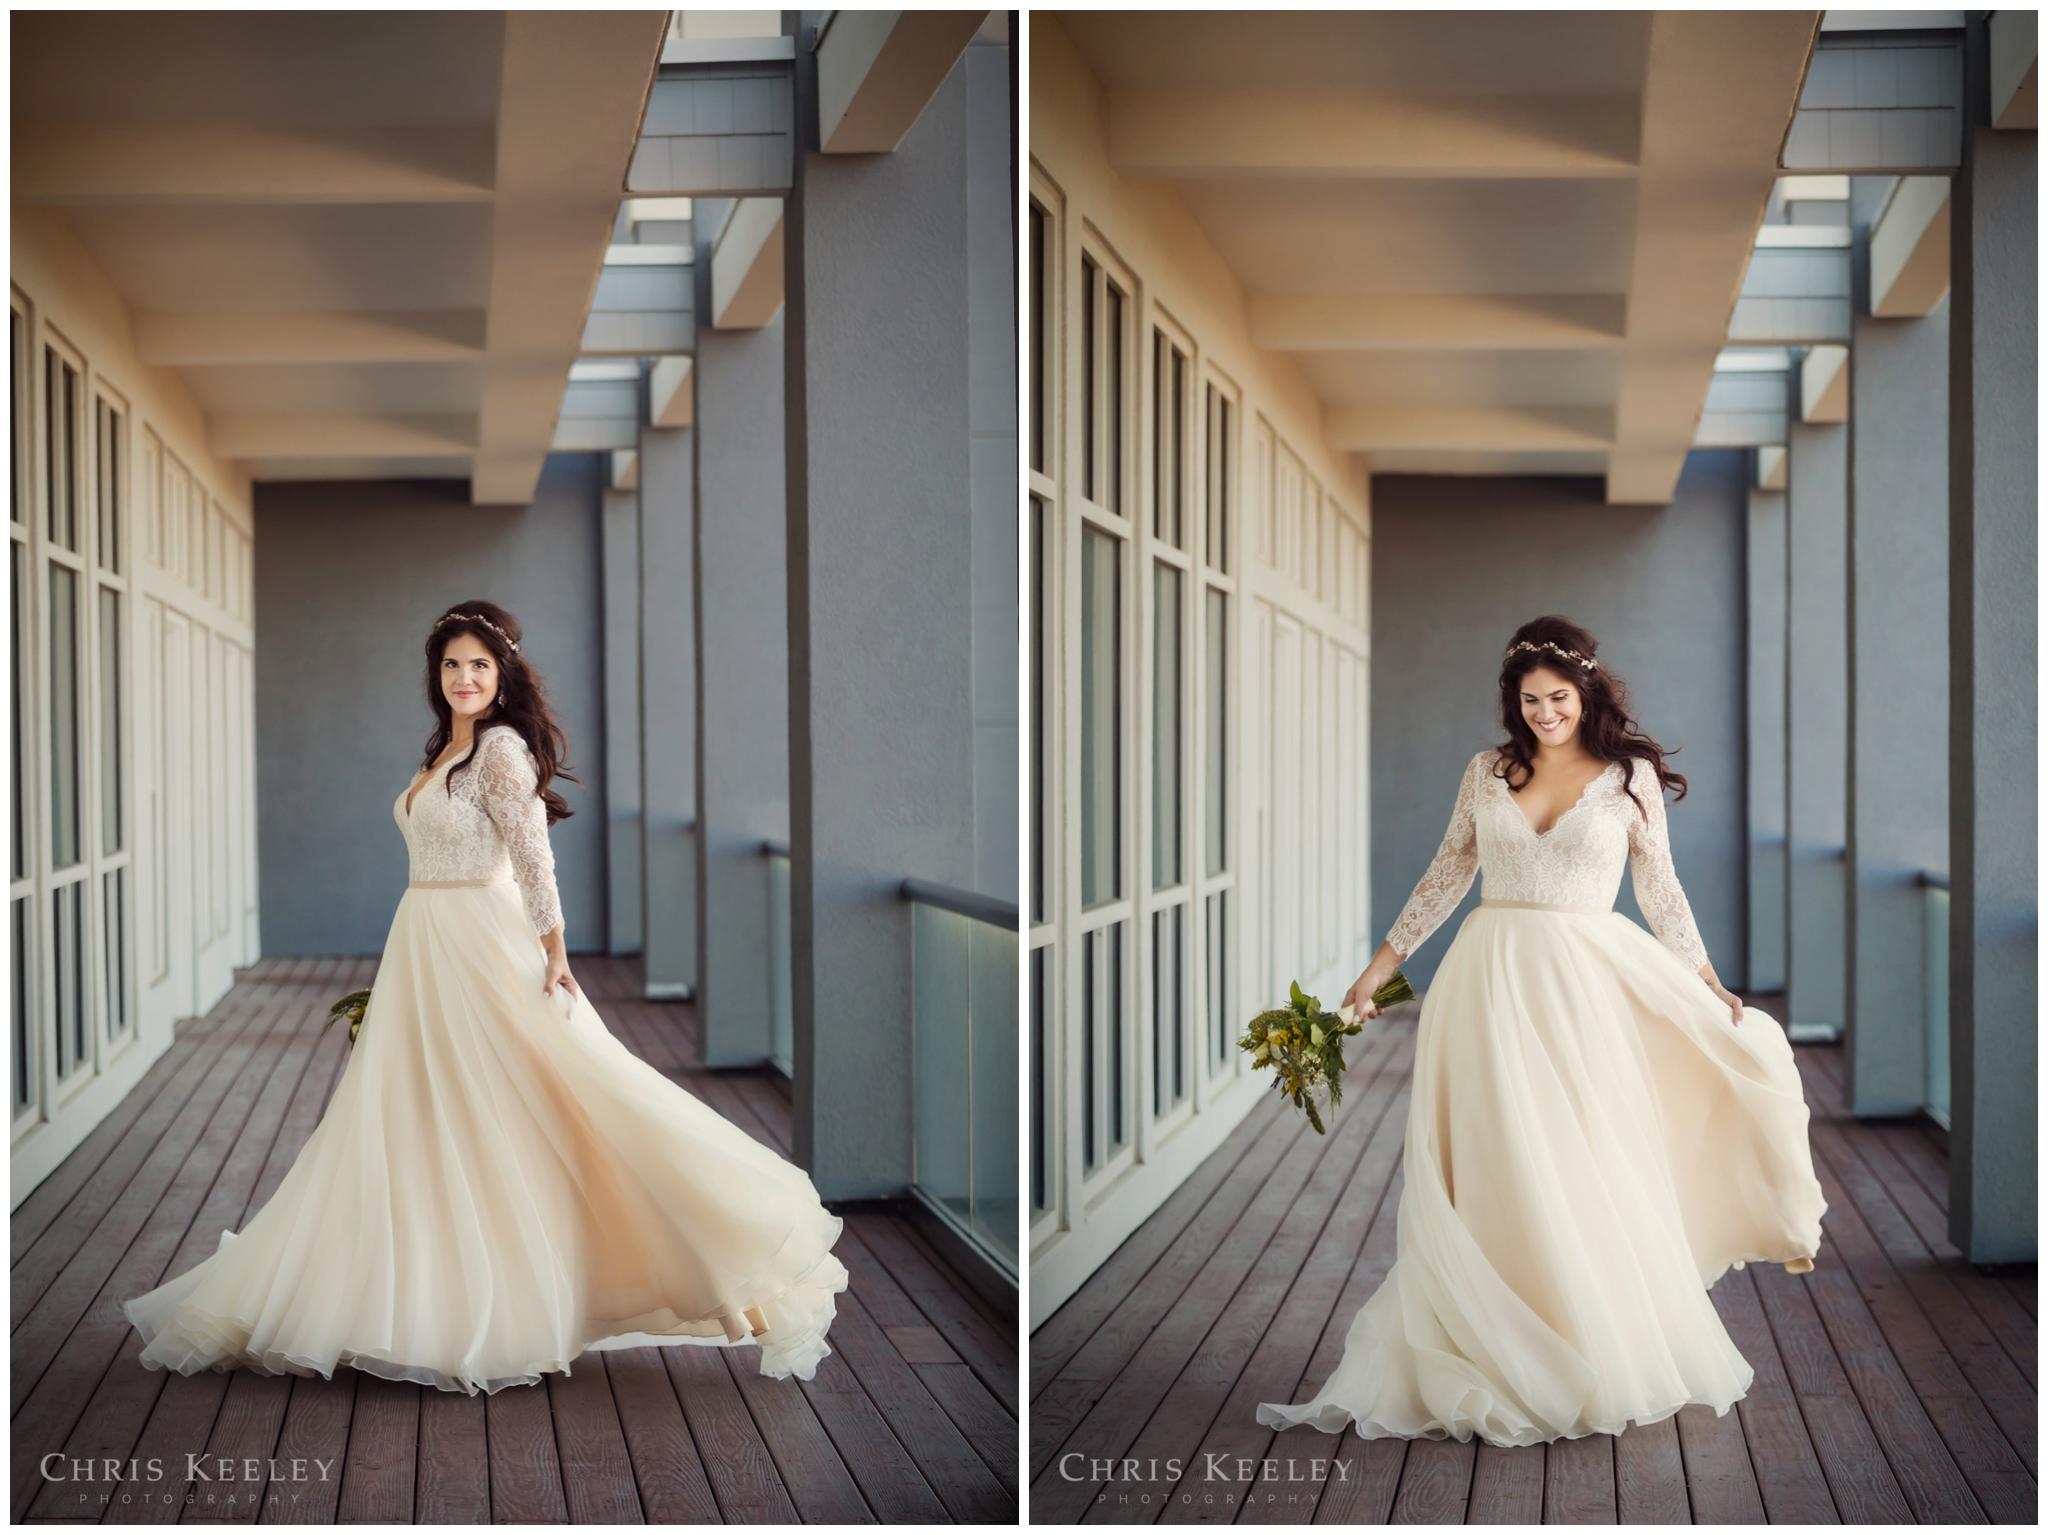 mckenzie-jeff-cliff-house-wedding-new-hampshire-wedding-photographer-chris-keeley-16.jpg